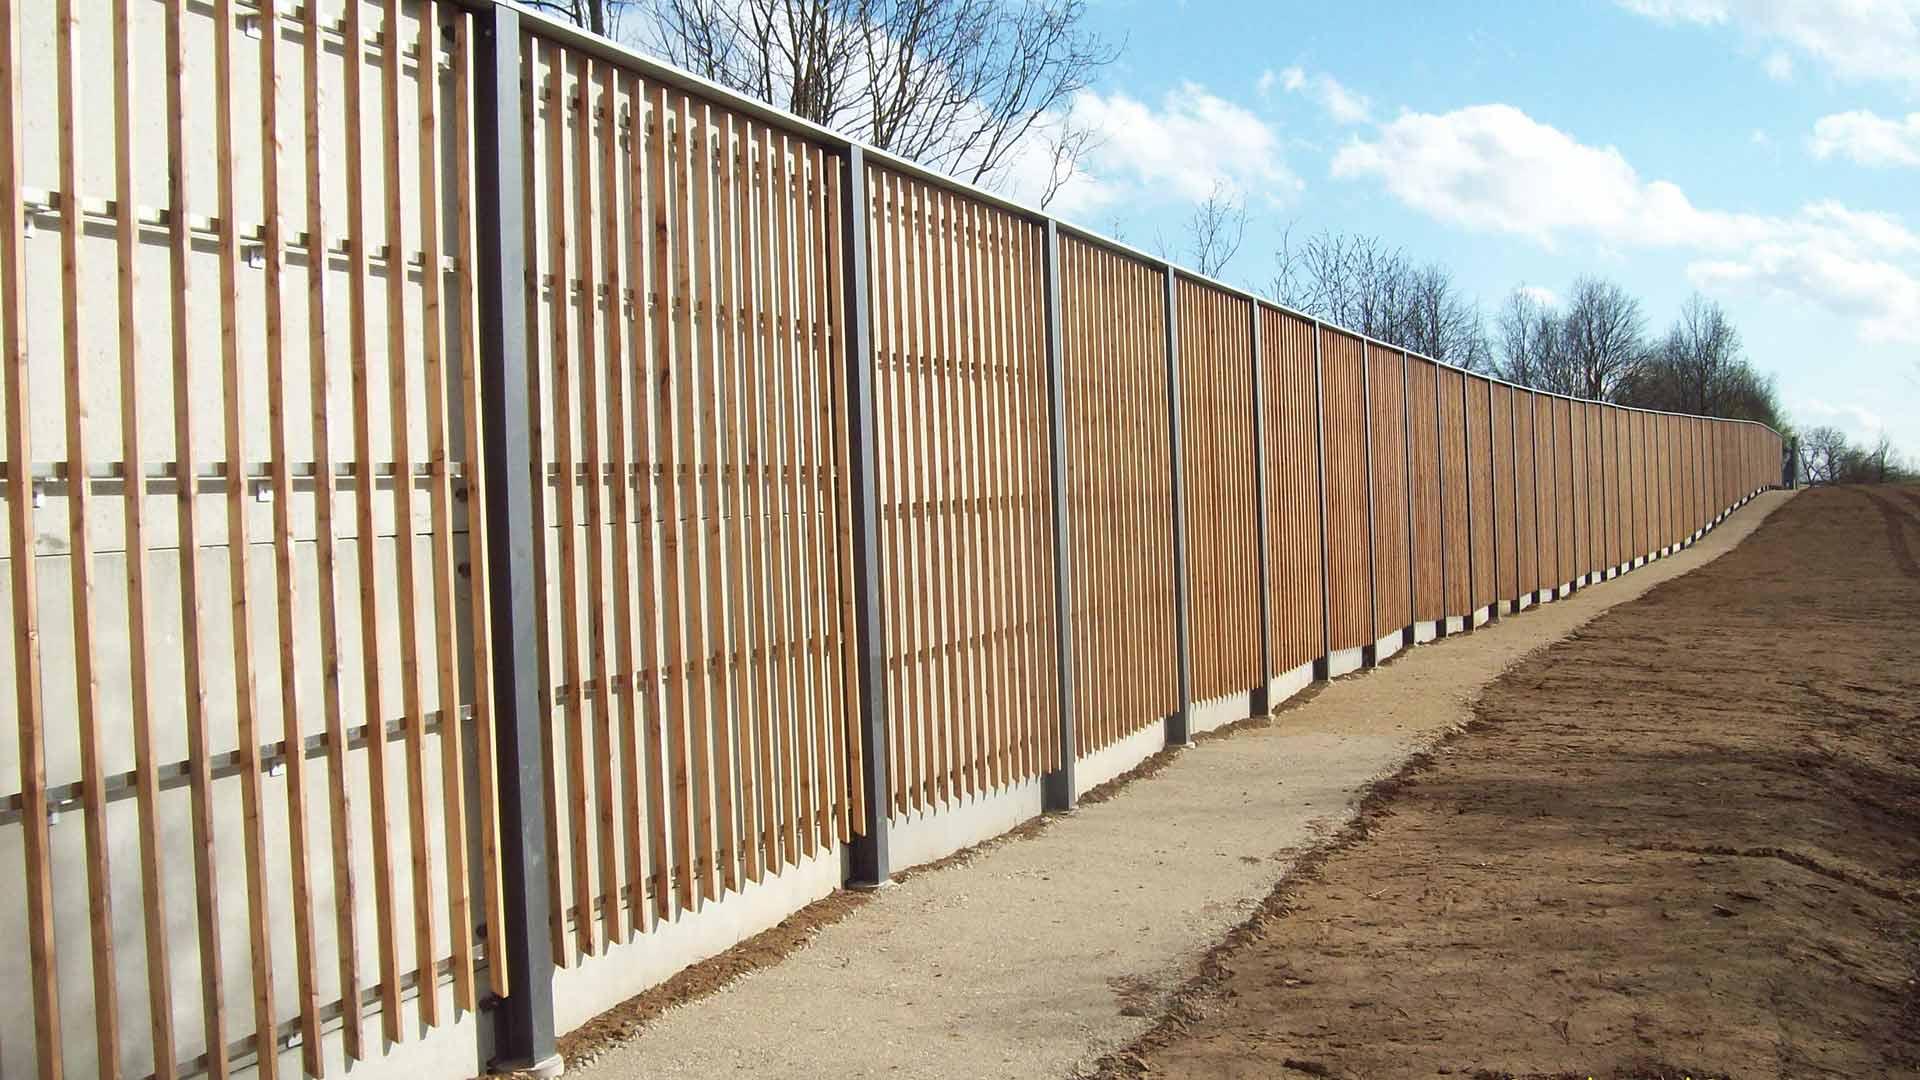 Lärmschutzwand, Beton + Holzverkleidung (Rücks.), Bayern